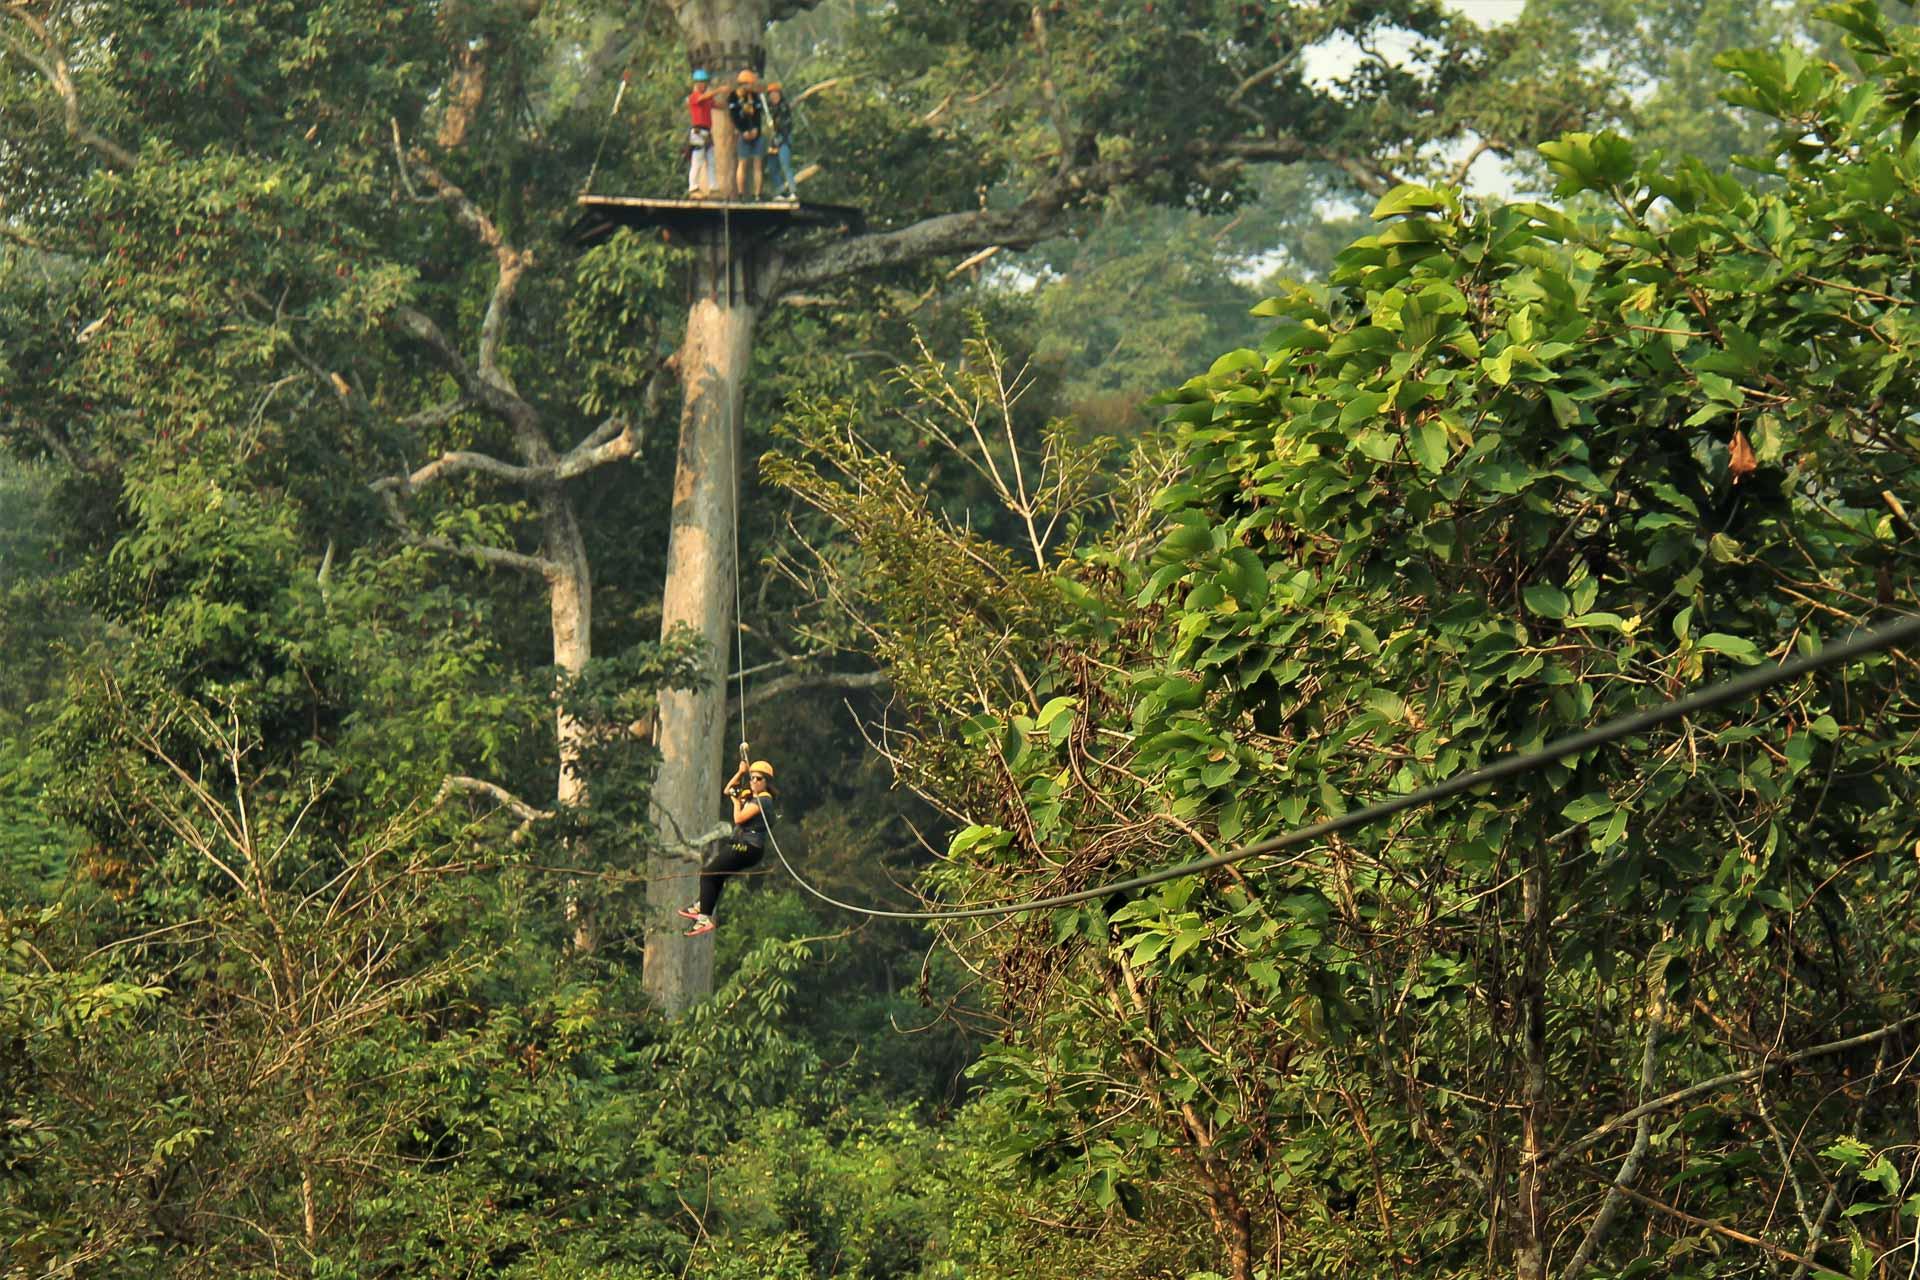 Lesvoyageuses-teste-par-les-voyageuses-tyrolienne-siem-reap-cambodge-angkor-zipline-3